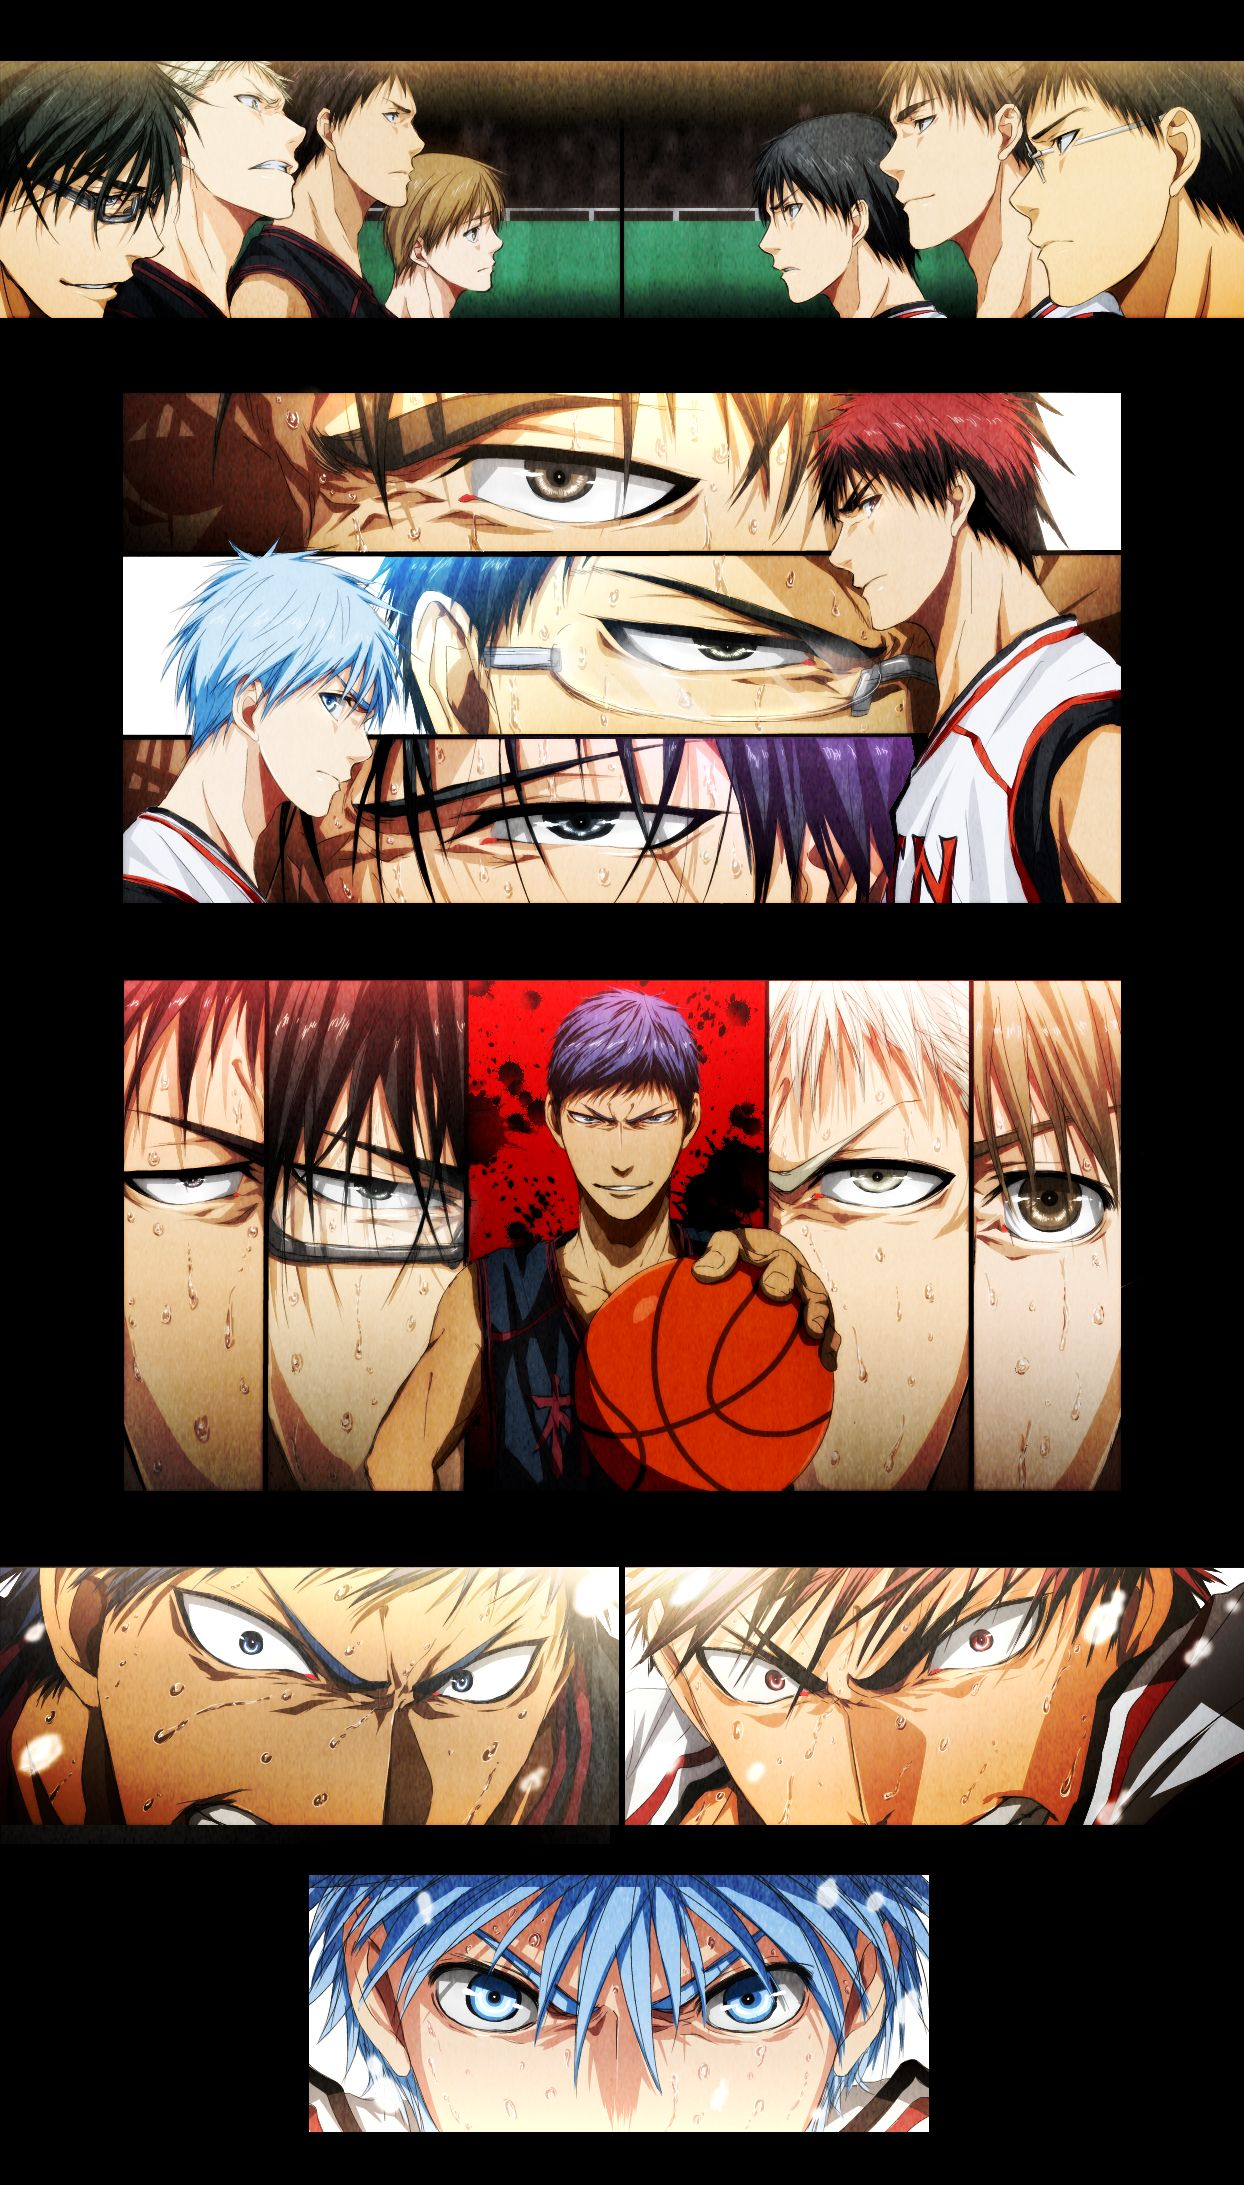 Pin by Kamui Yato on Anime Kuroko no basket, Kuroko's